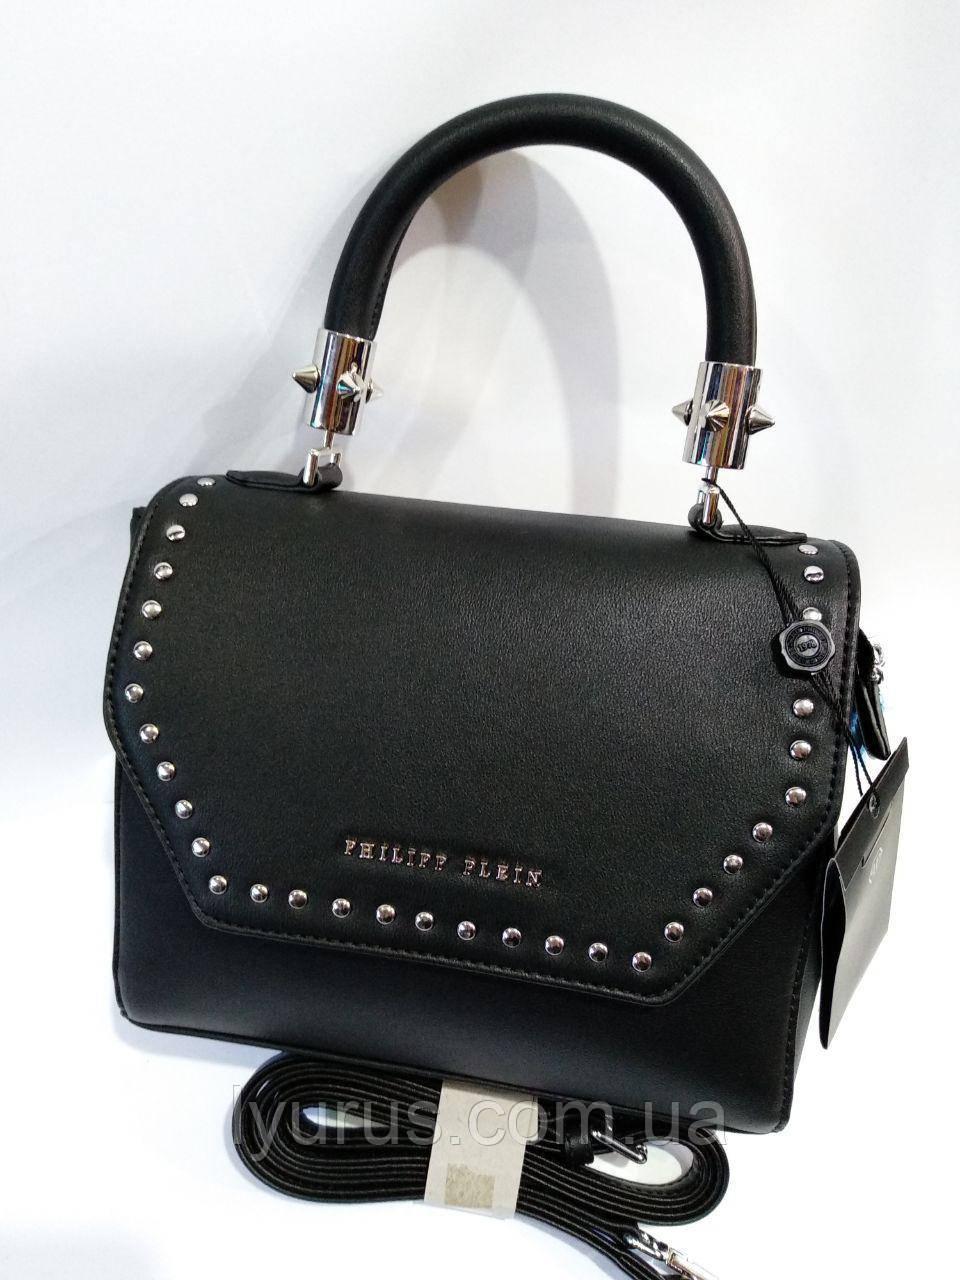 Женская сумка PHILIPP PLEIN (Филипп Плейн)